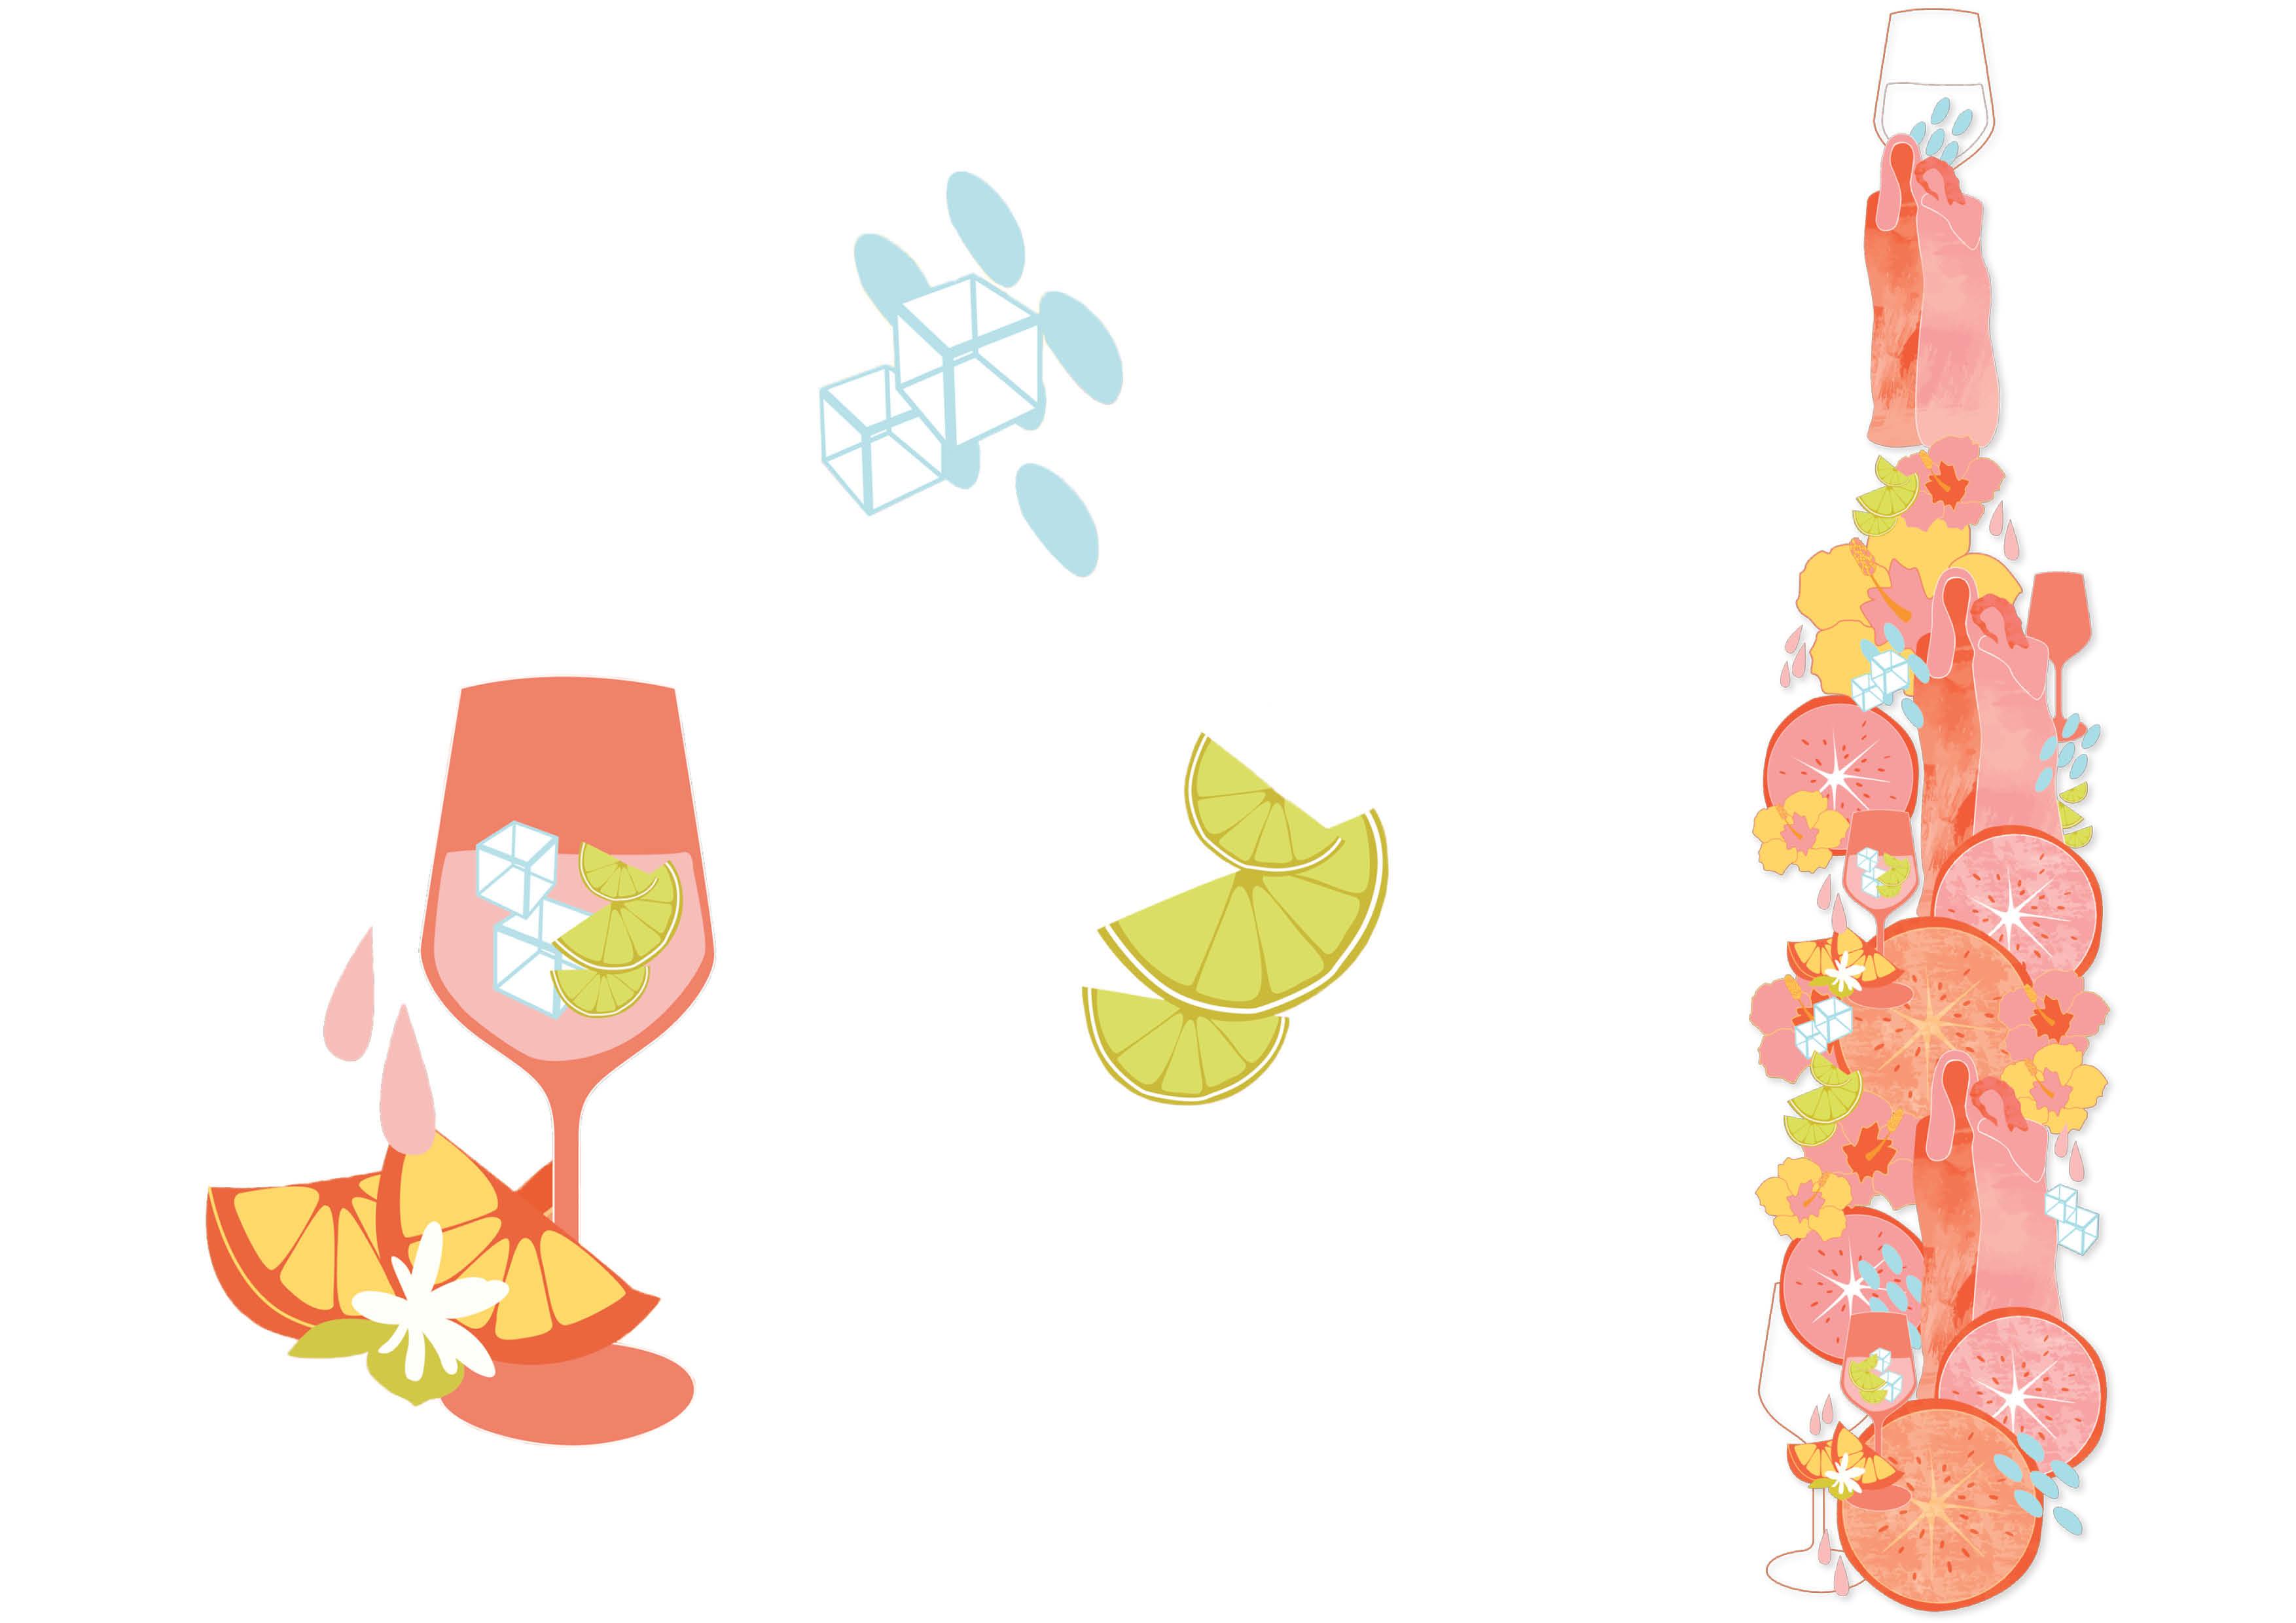 Ramazzotti Aperitivo Rosato Packaging Design - Illustrations by Magdalena Weiss